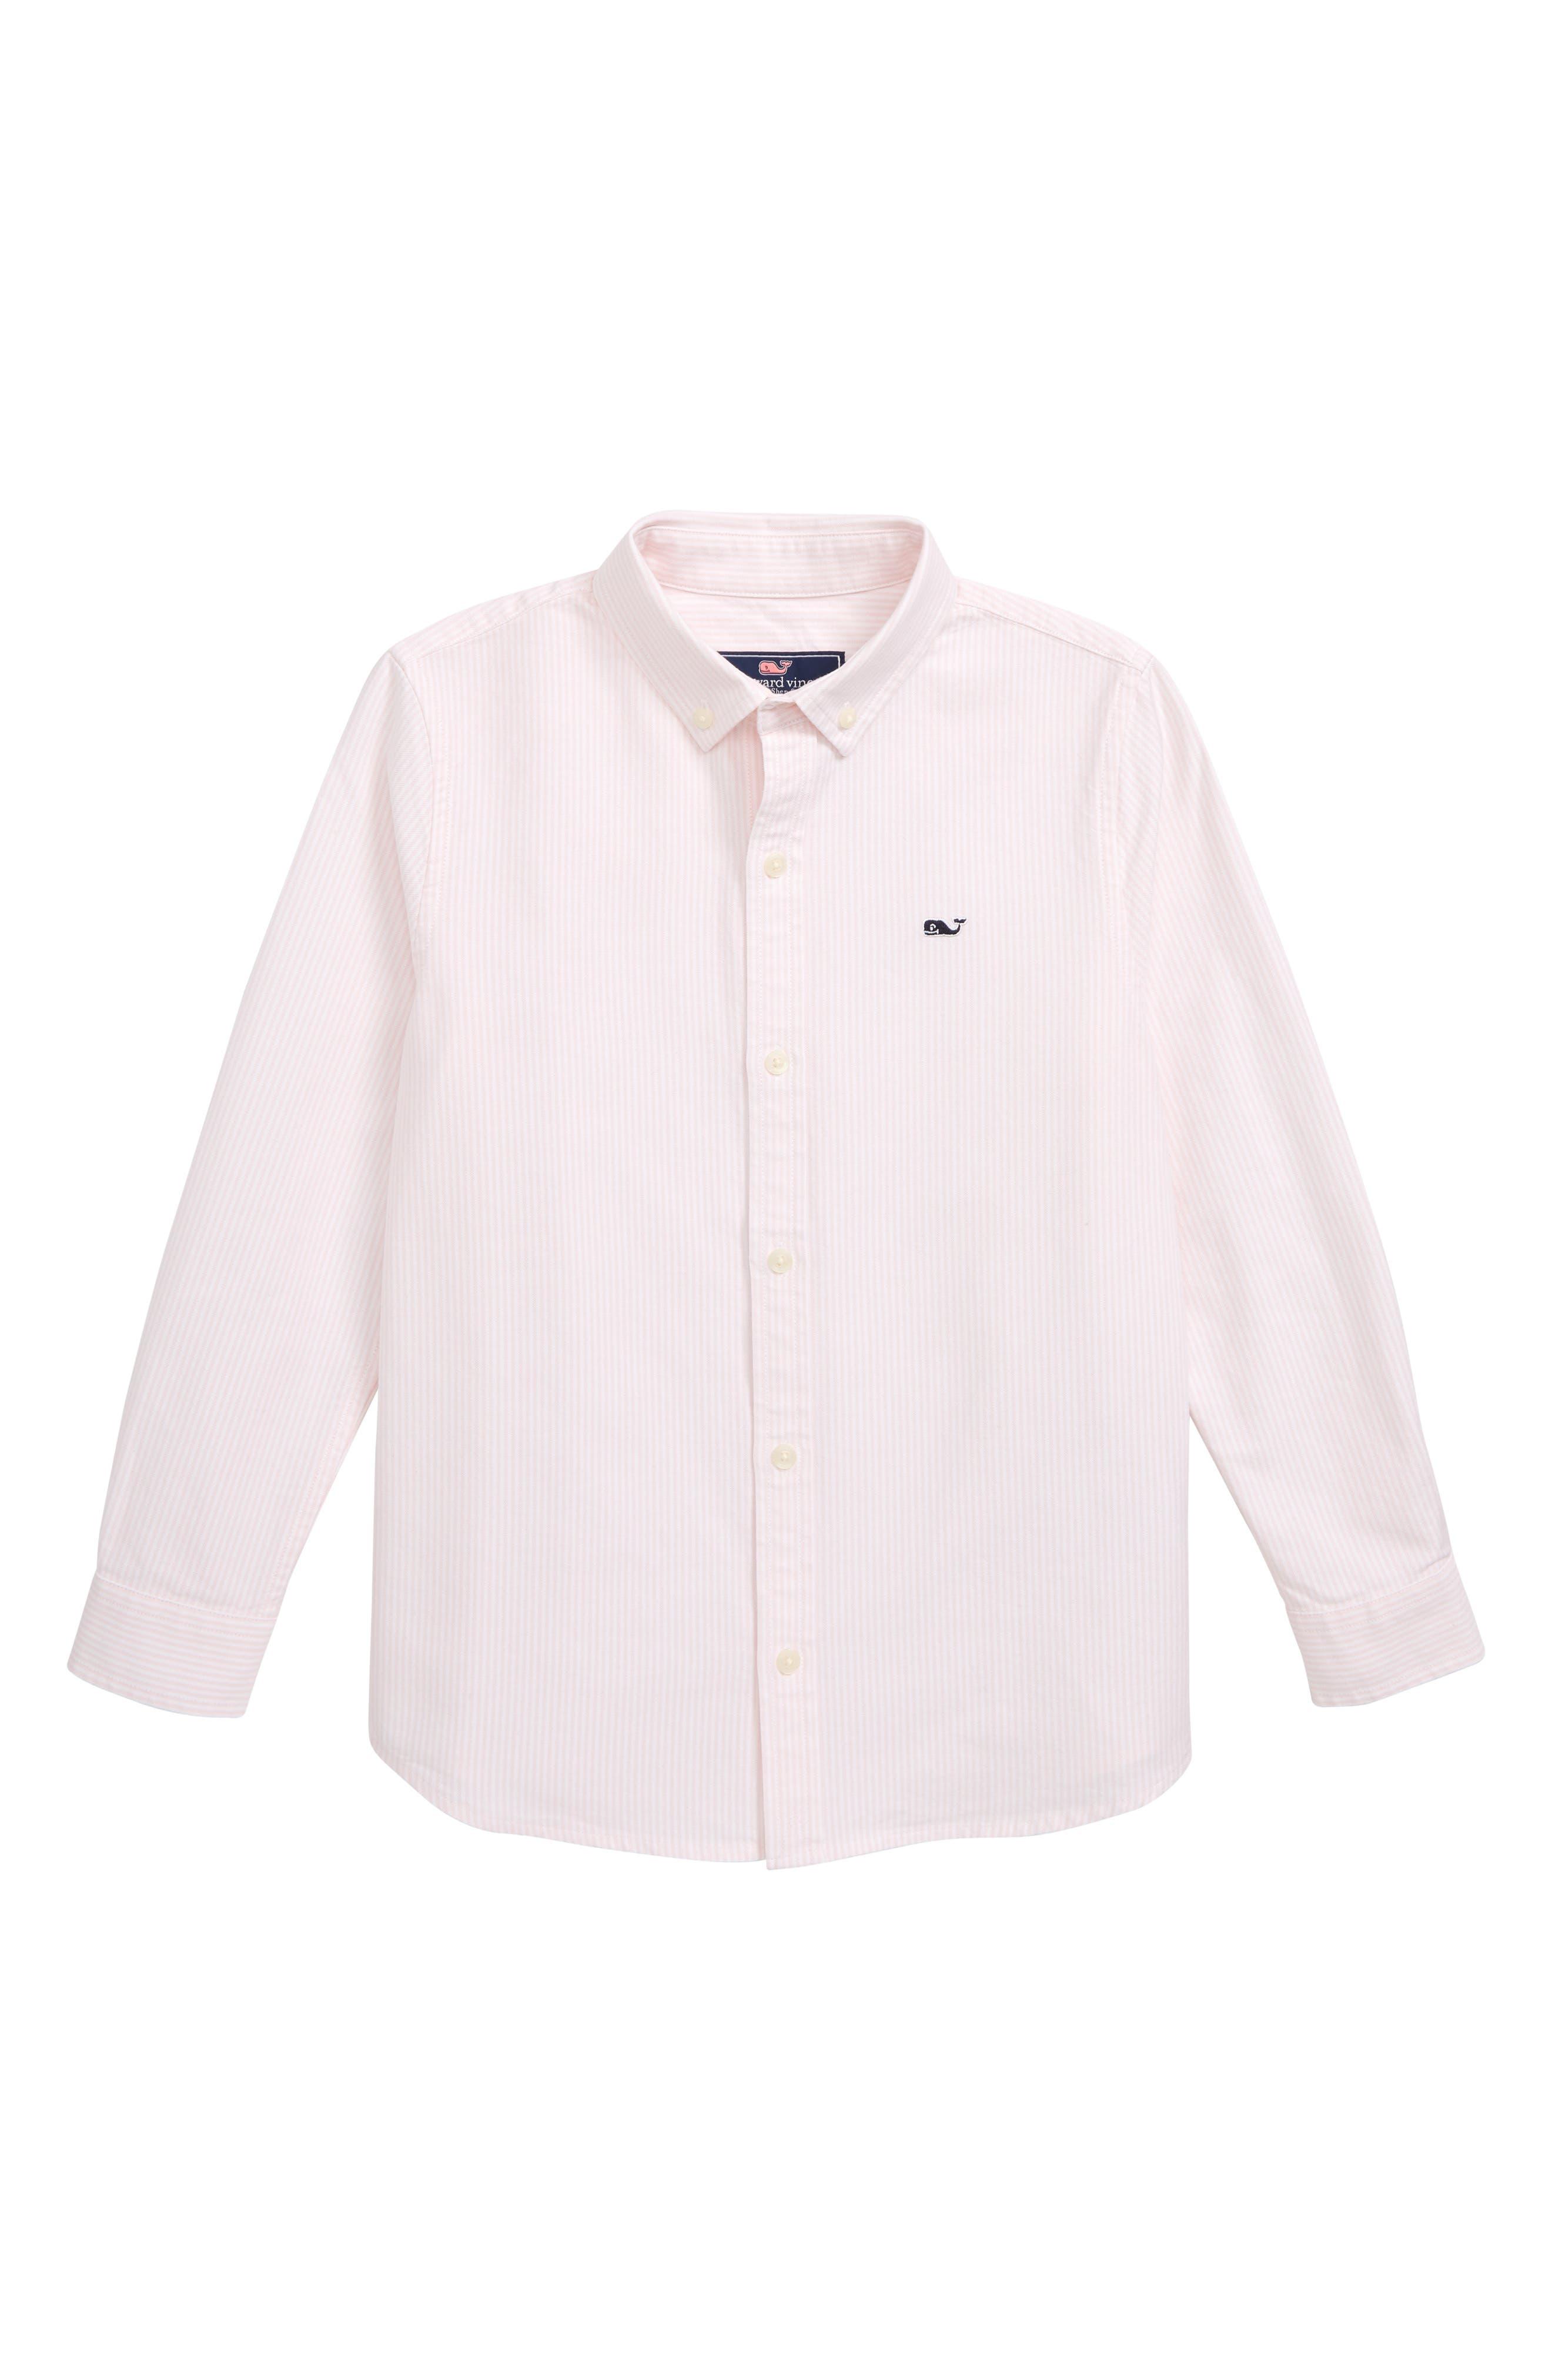 Fine Line Stripe Oxford Shirt,                             Main thumbnail 1, color,                             FLAMINGO